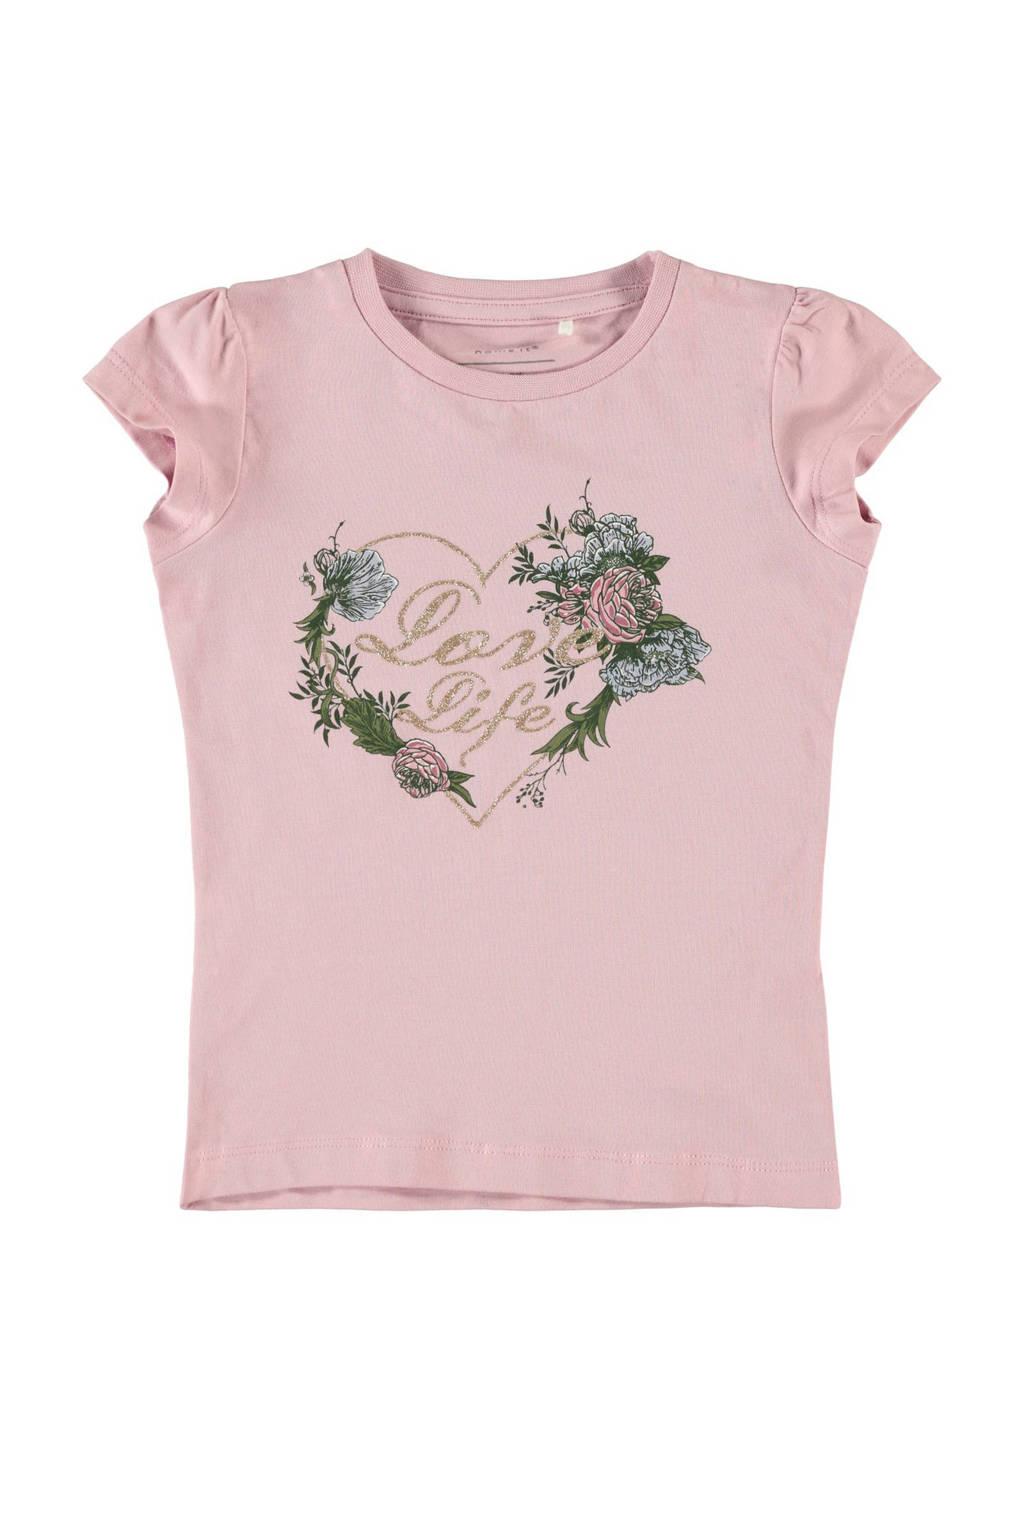 NAME IT MINI T-shirt Fallu met biologisch katoen roze/groen, Roze/groen